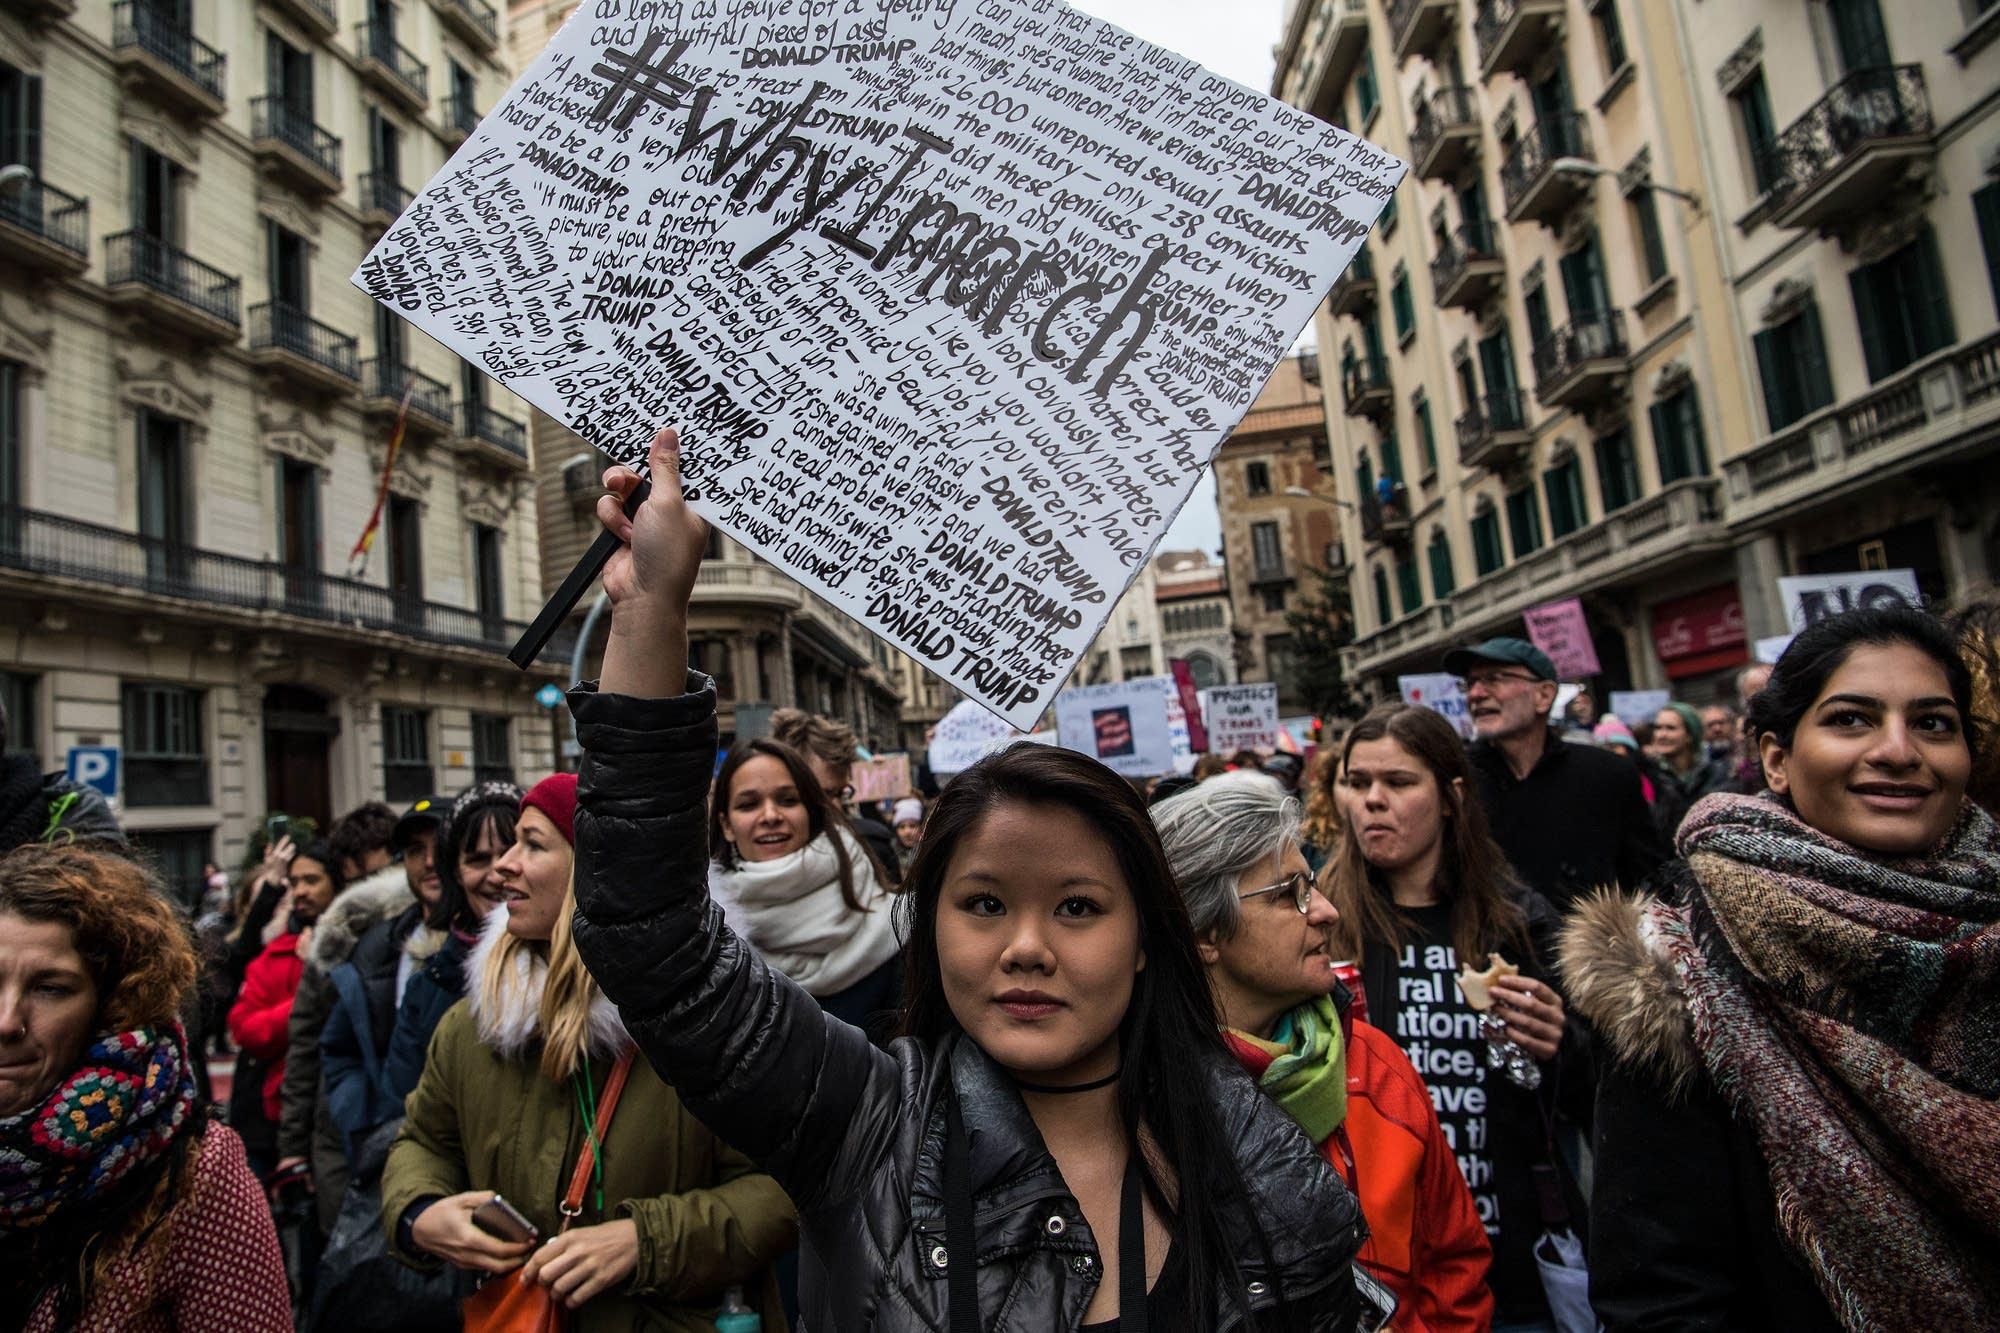 Barcelona, Spain: Demonstrators march in world solidarity.